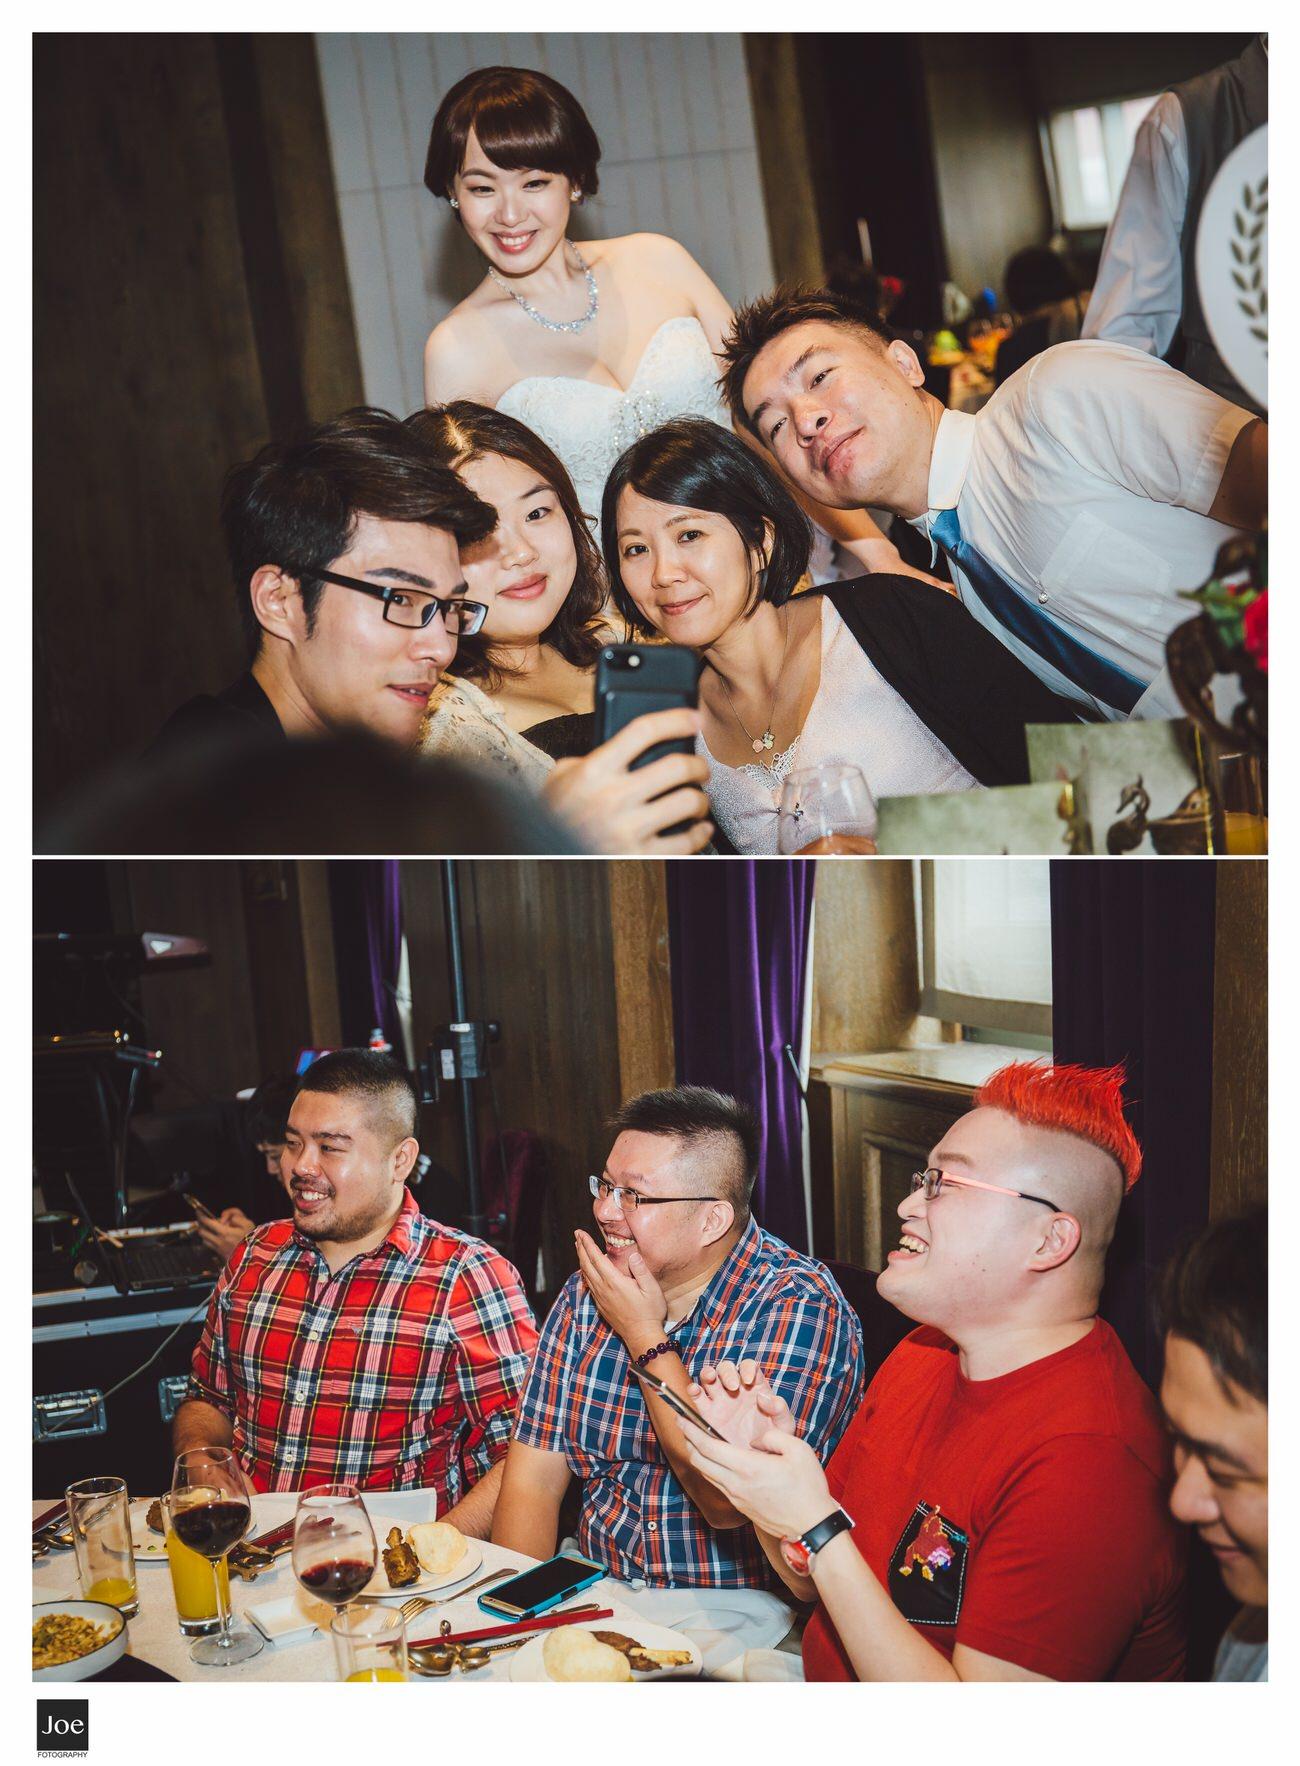 joe-fotography-wedding-photo-palais-de-chine-hotel-040.jpg